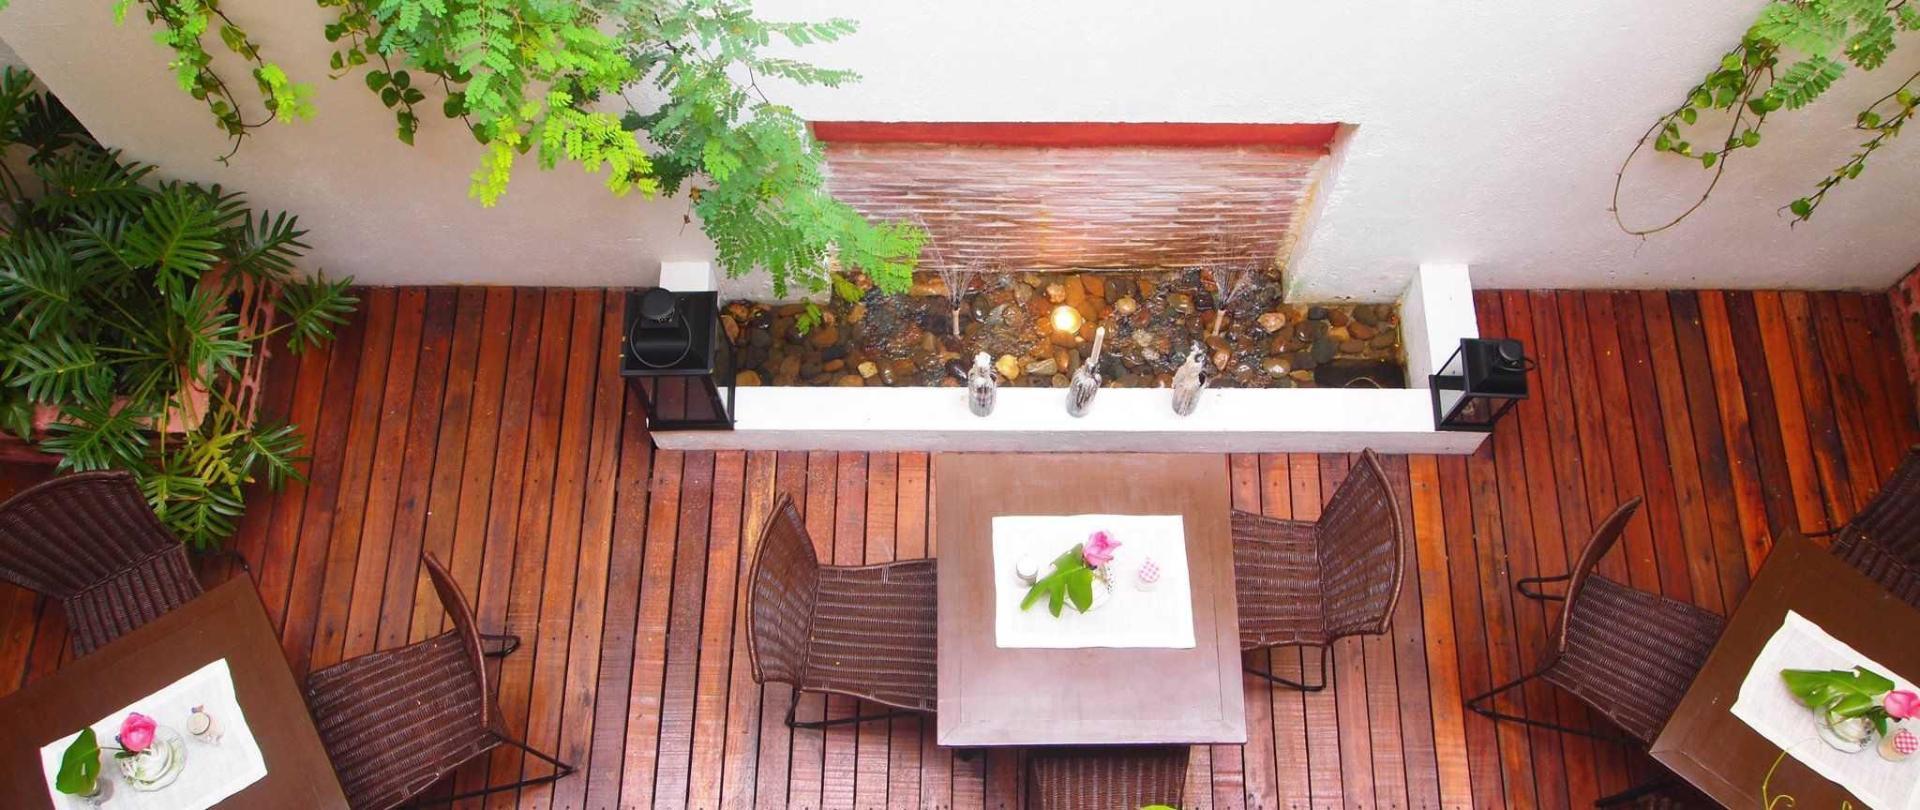 patio2-leclerc-hotel-cali.jpg